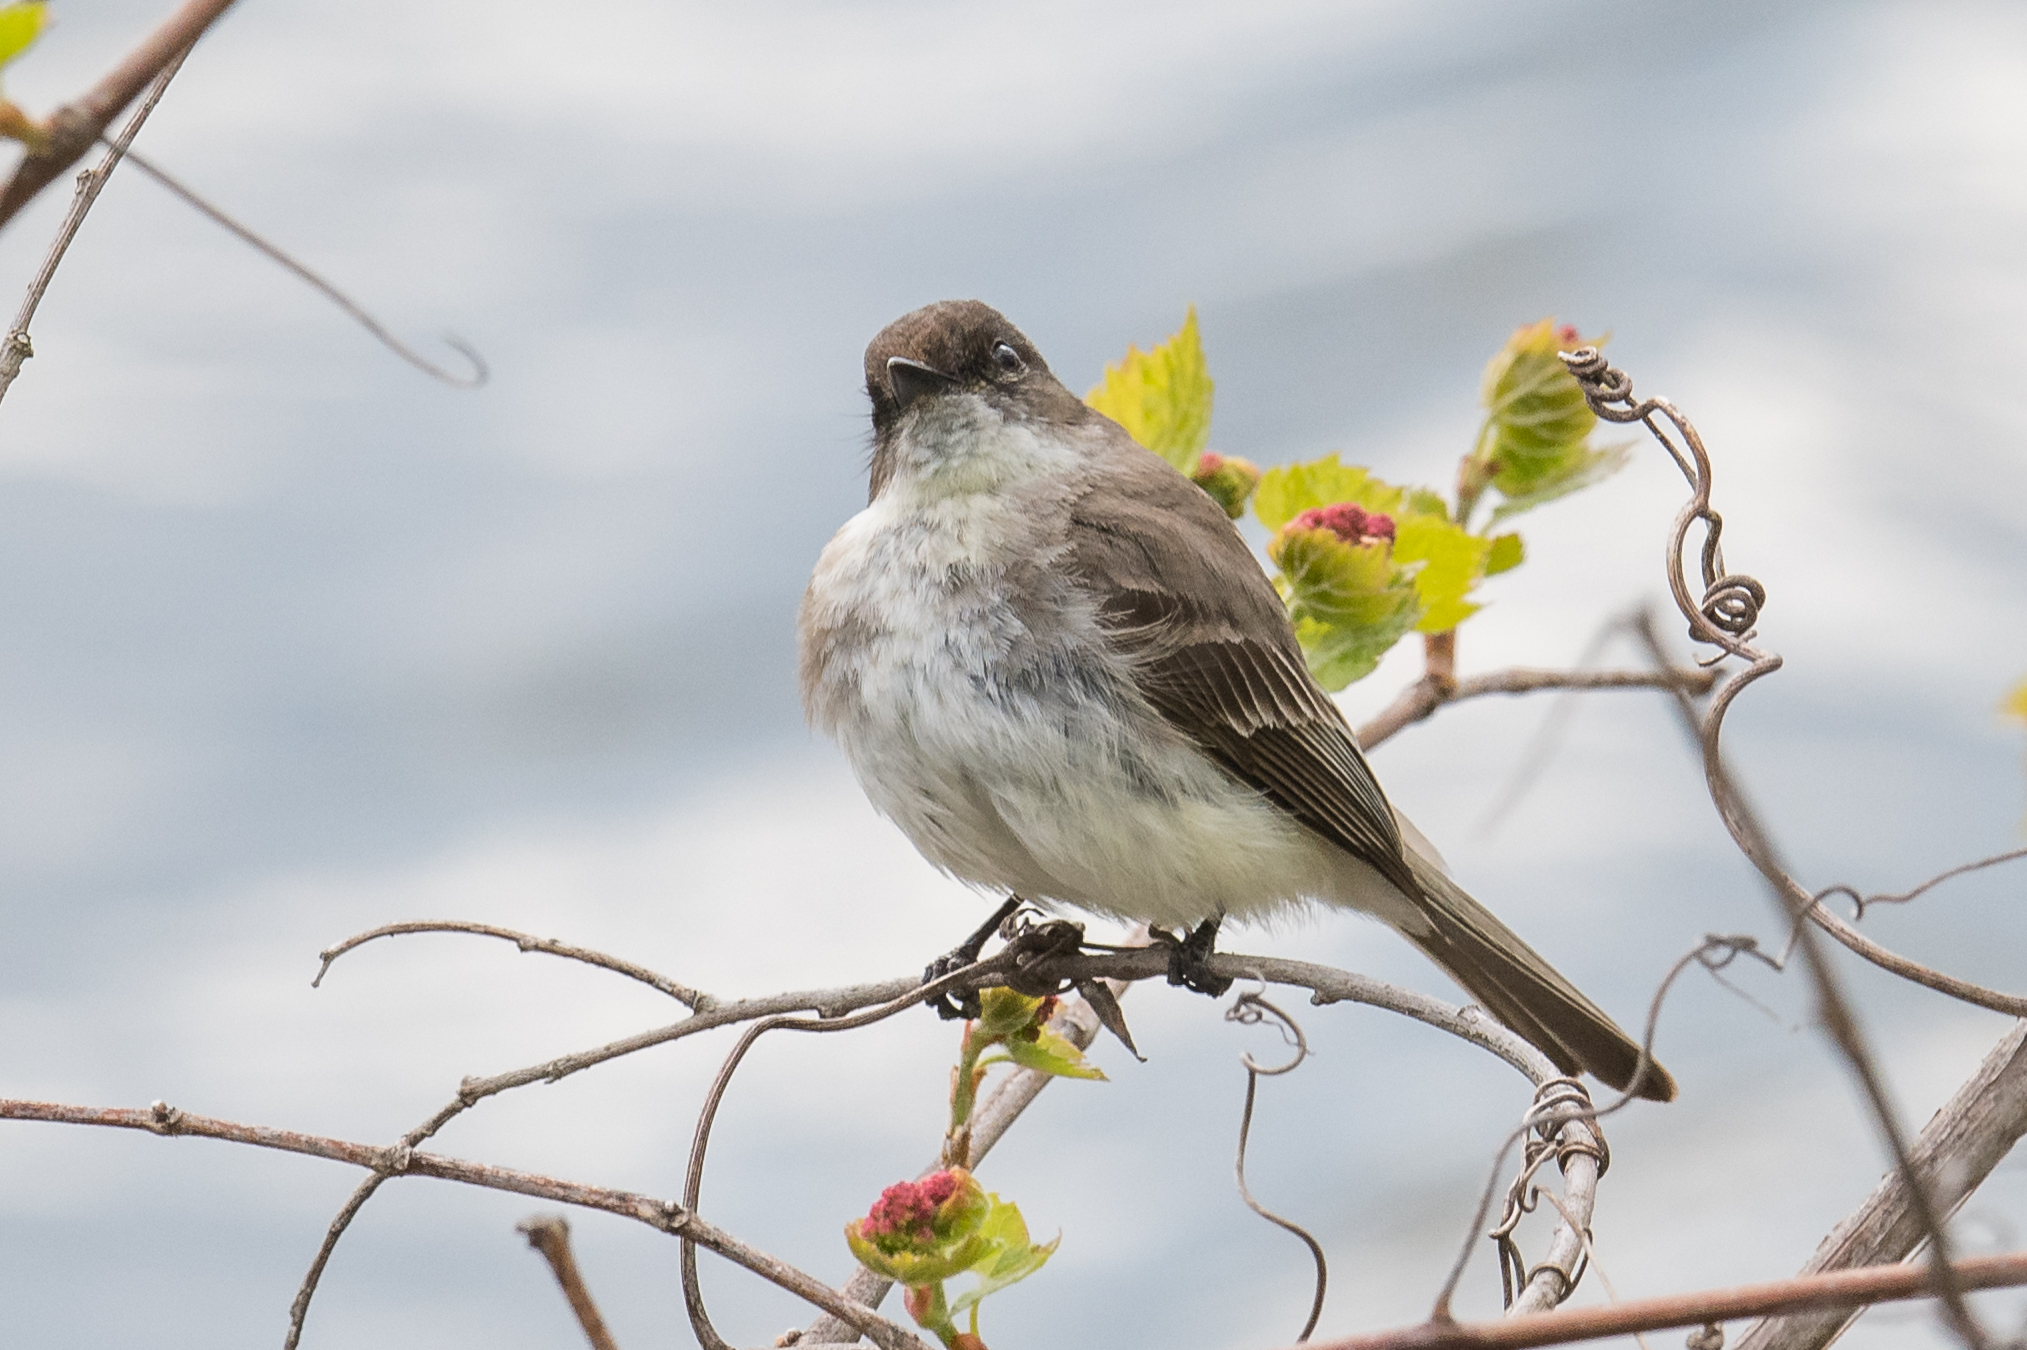 Eastern Phoebe (Sayornis phoebe): Shiawassee NWR, SAG (MI)